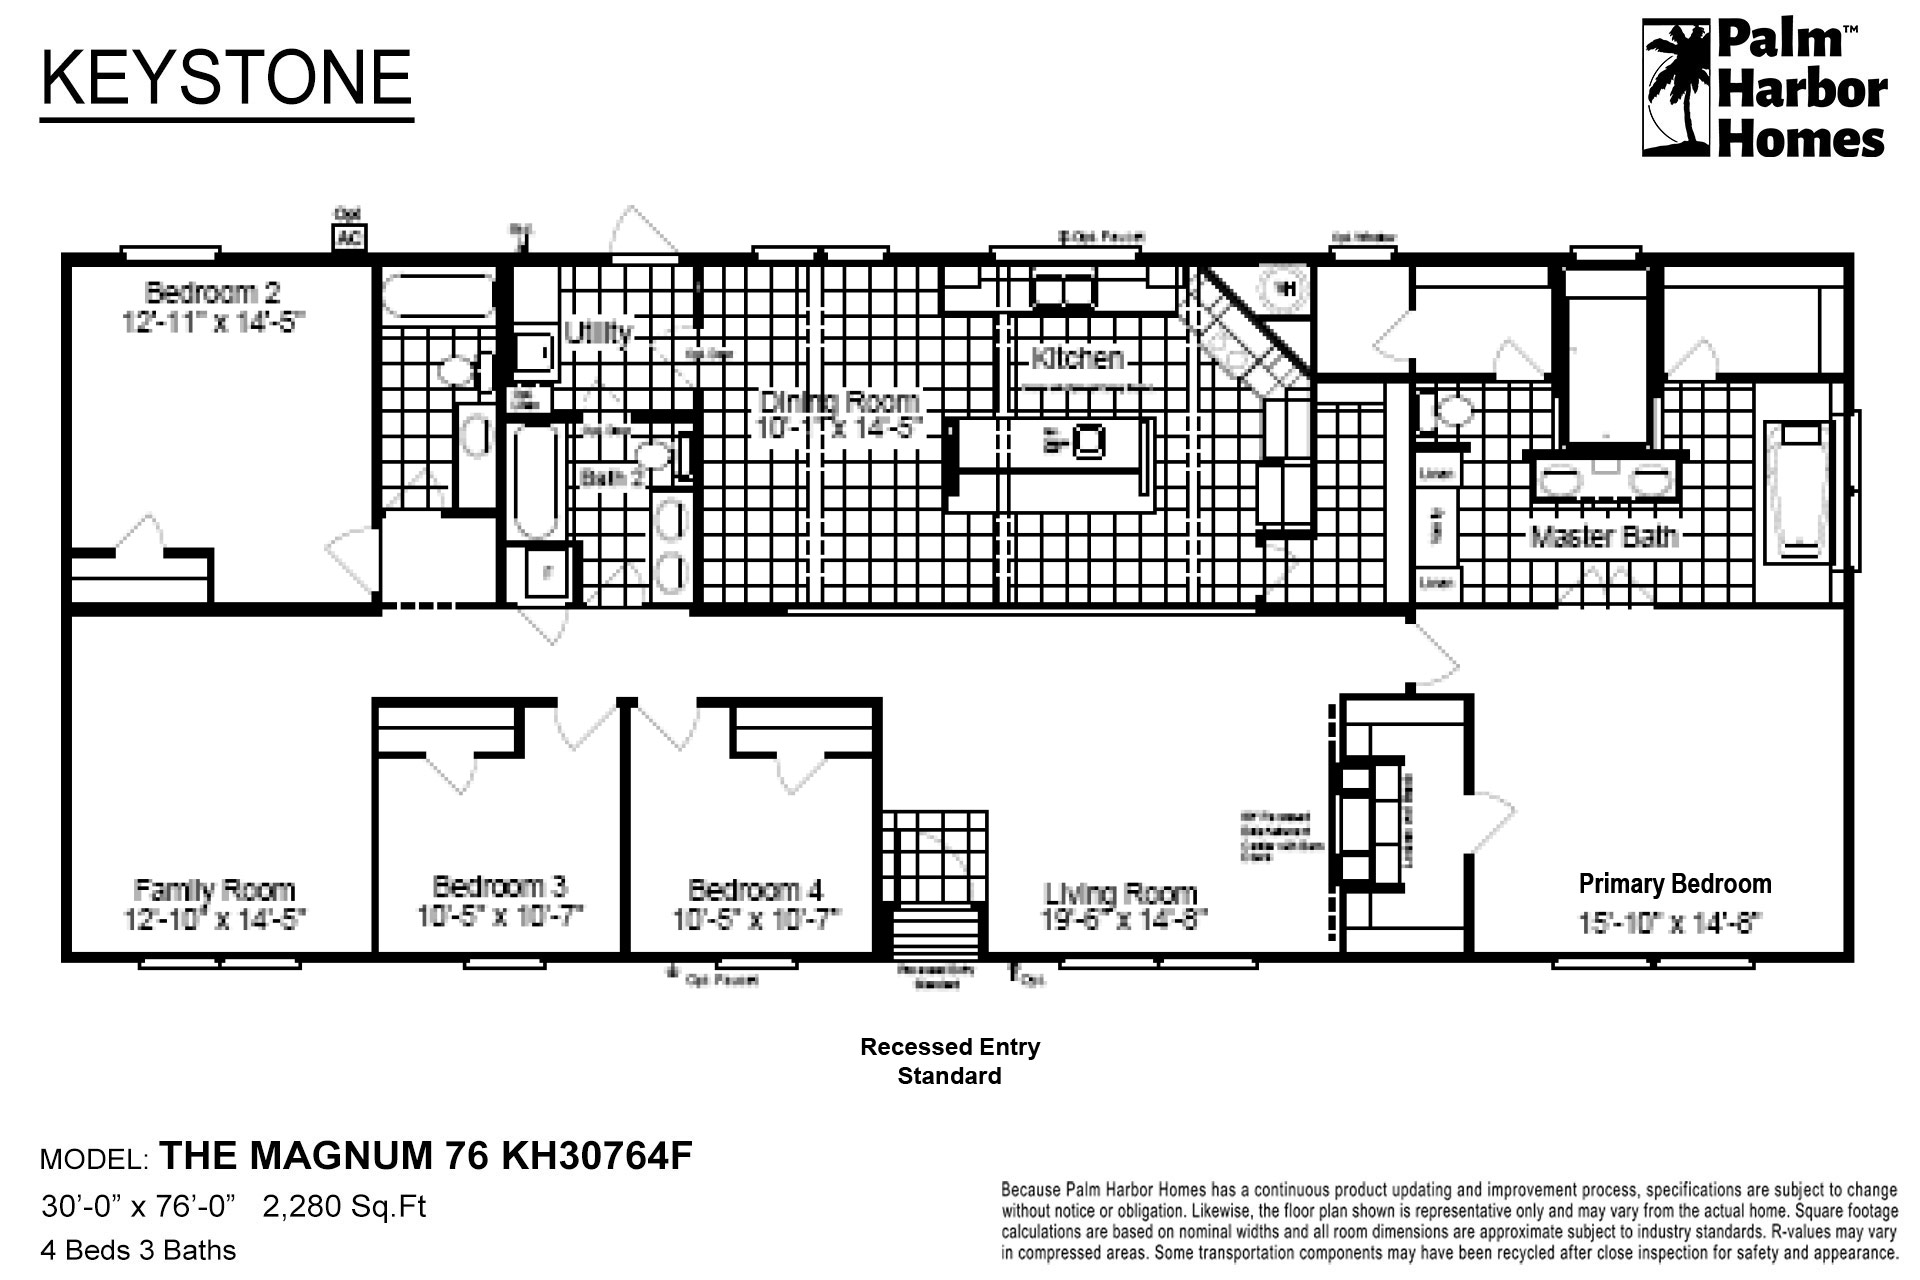 Keystone - The Magnum 76 KH30764F